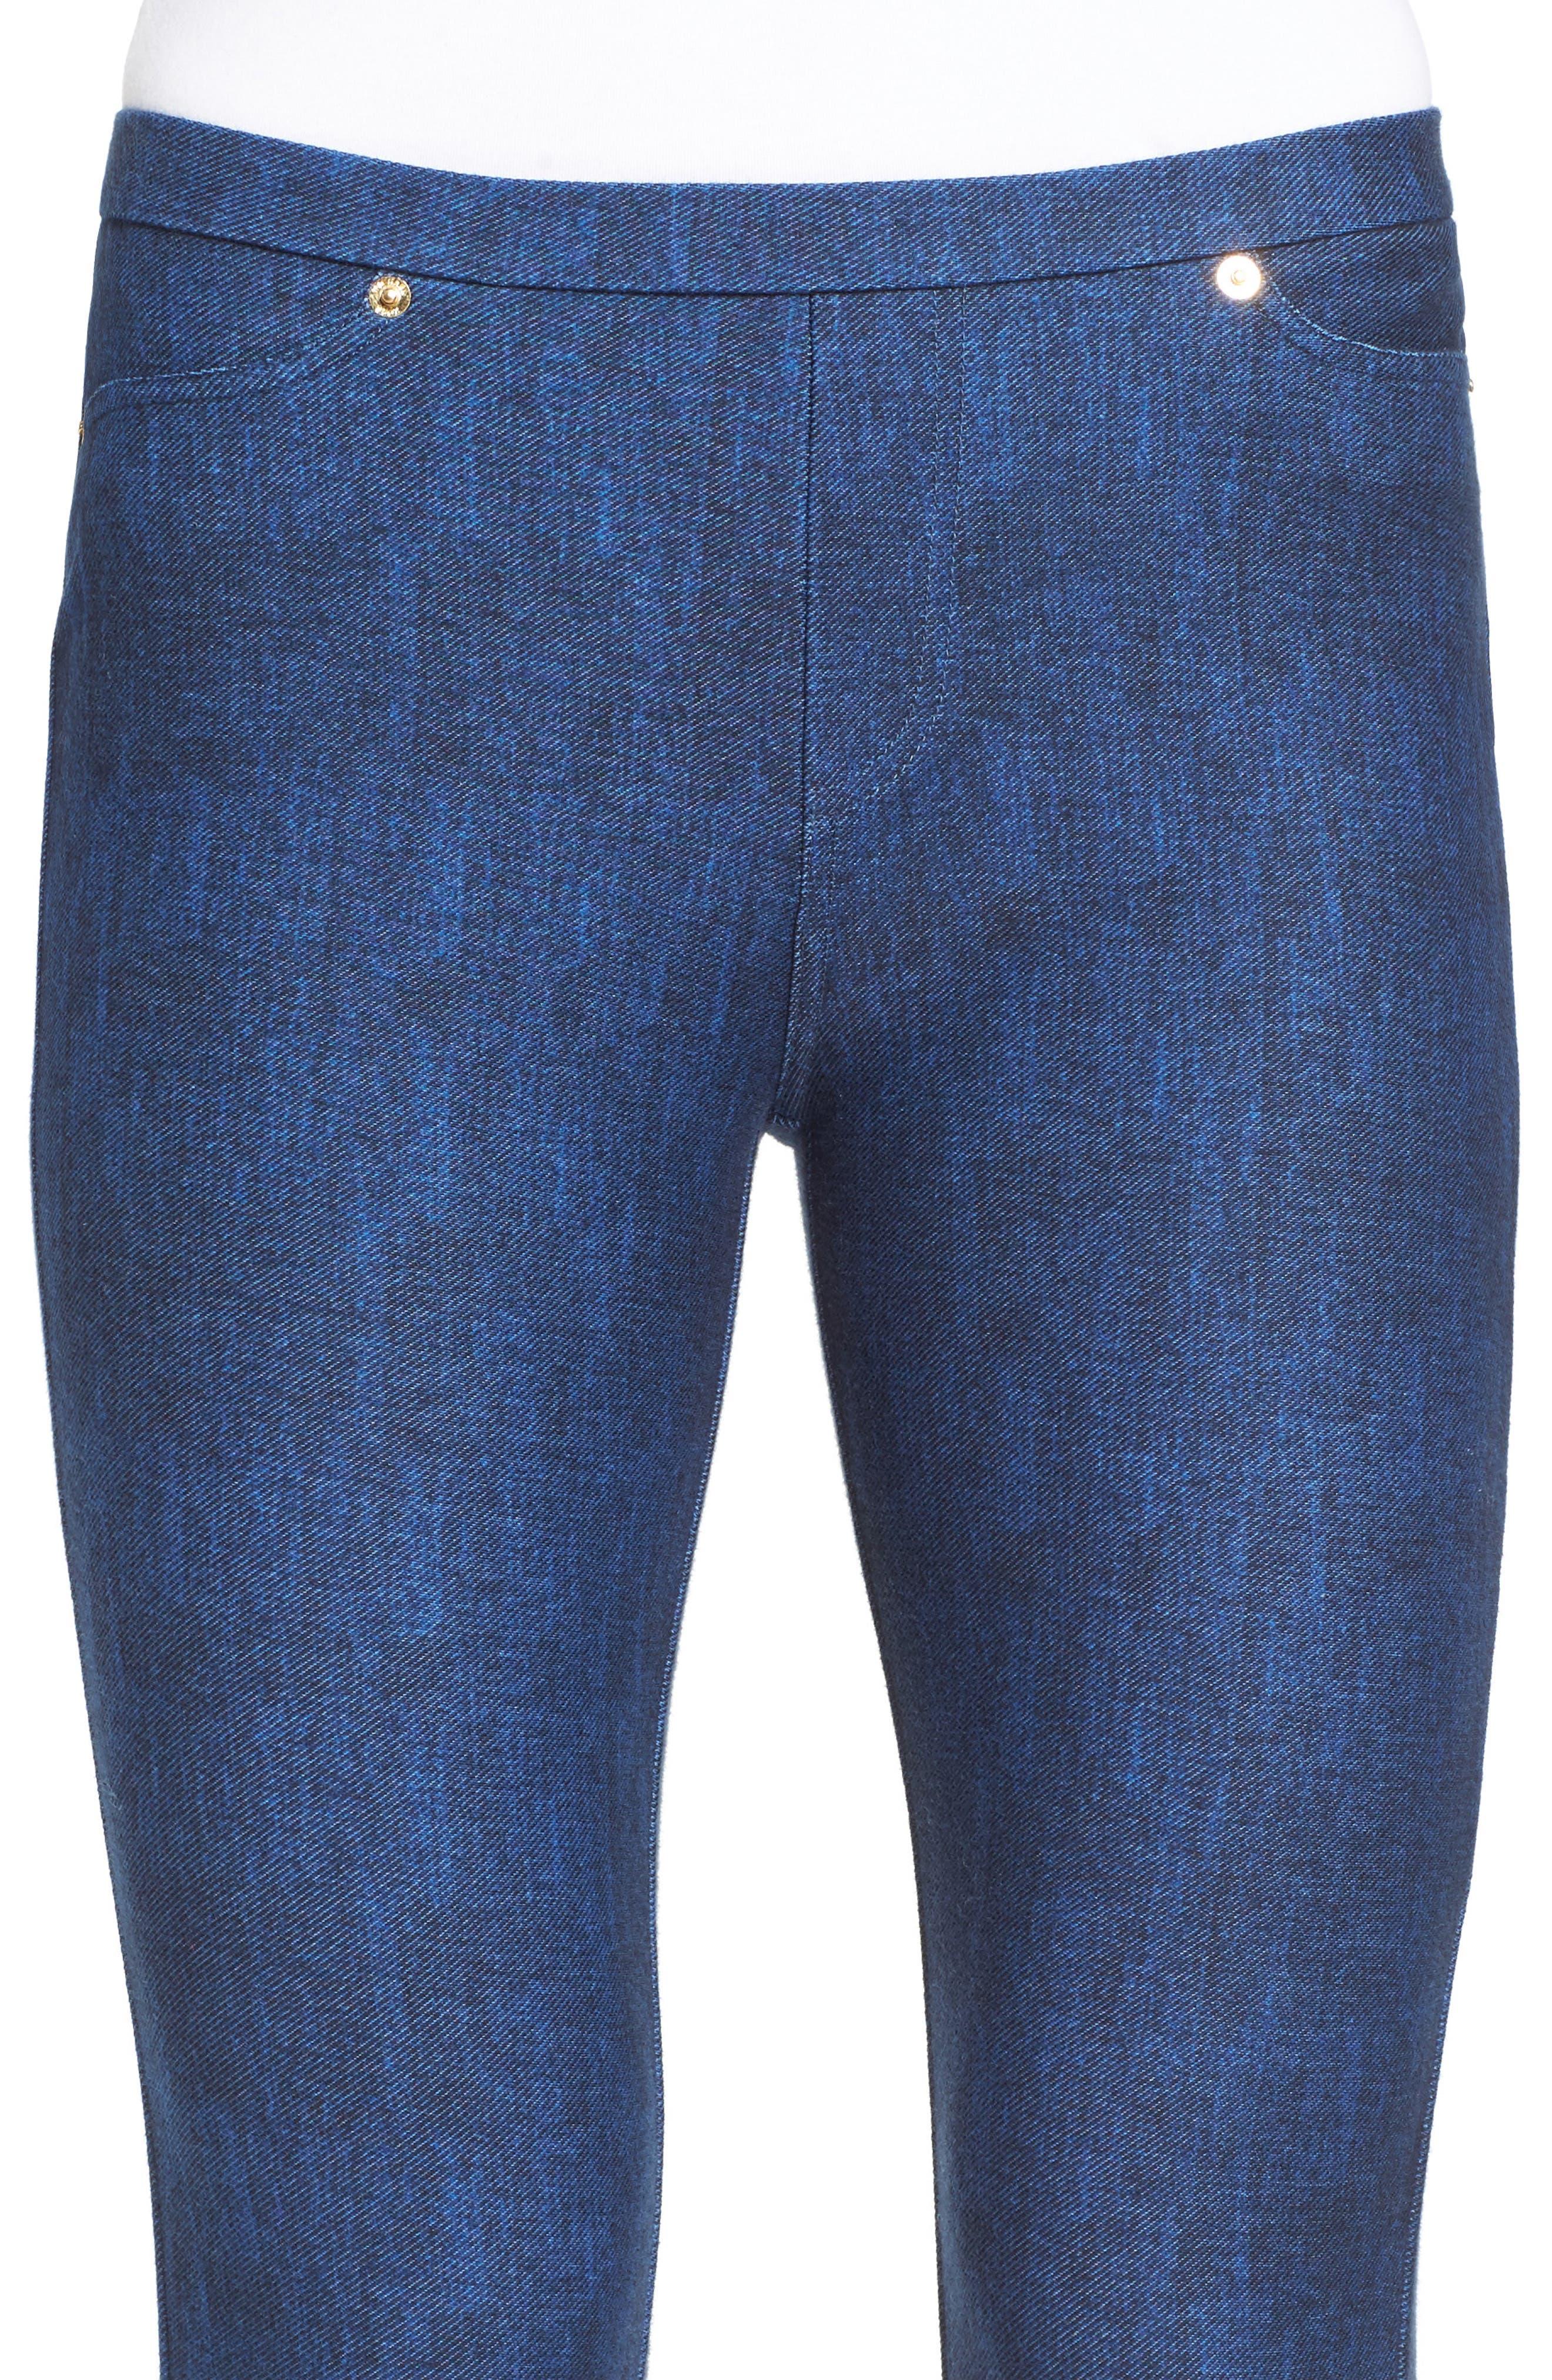 Michael Kors Denim Leggings,                             Alternate thumbnail 4, color,                             BLUE INDIGO